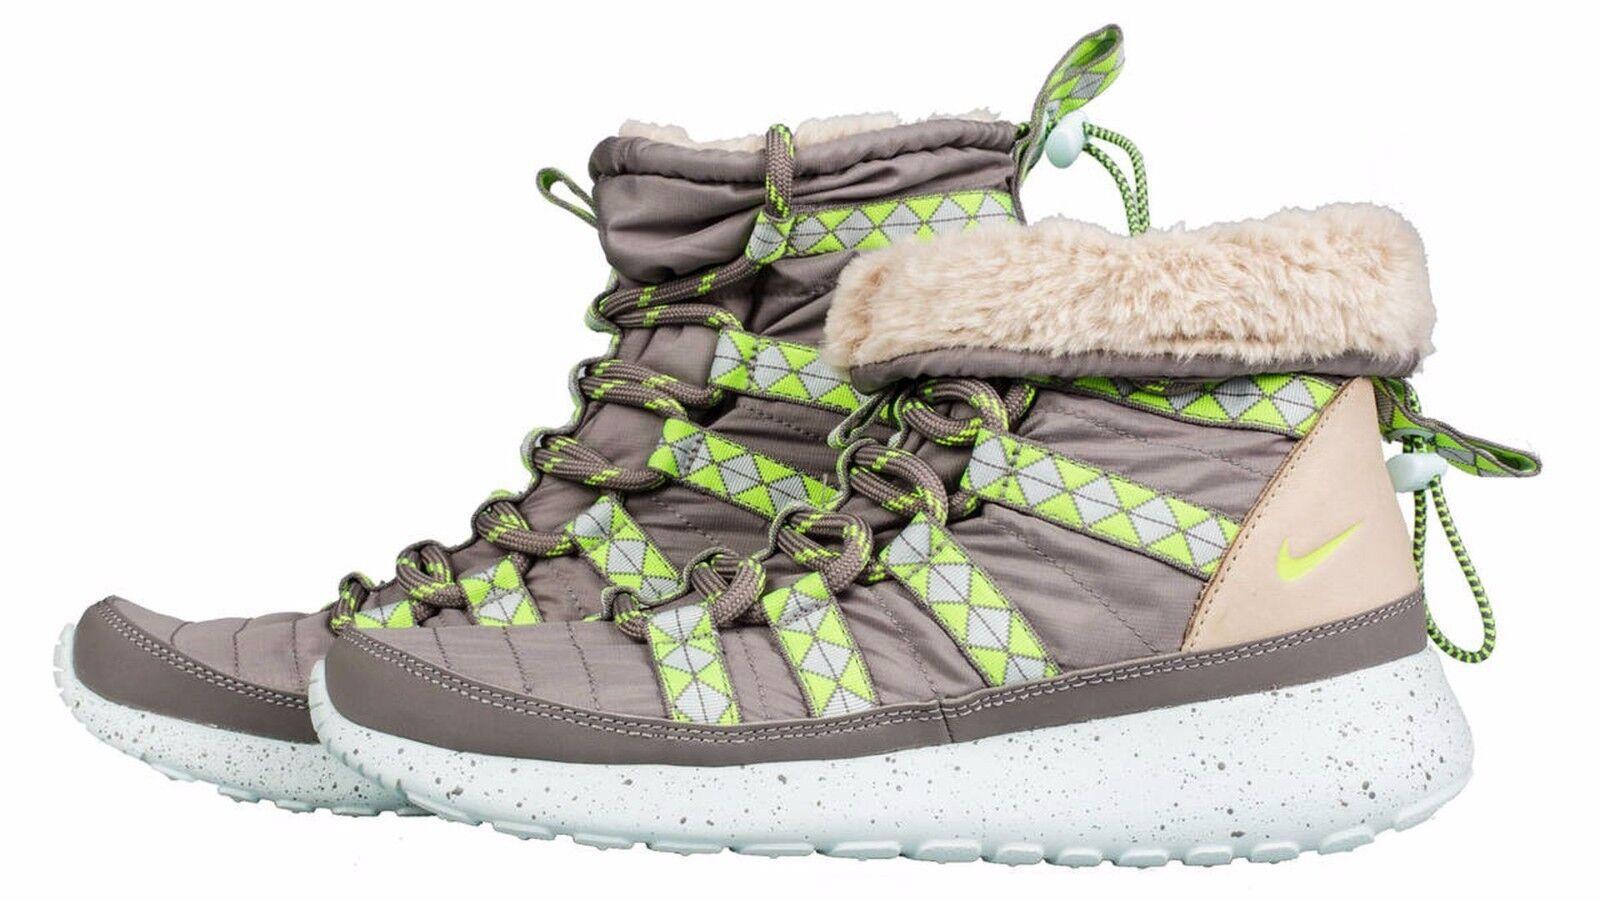 Nike Rosherun Hi Sneakerboot Print  Sz 7.5 Wmn 616724-001 Grey Volt